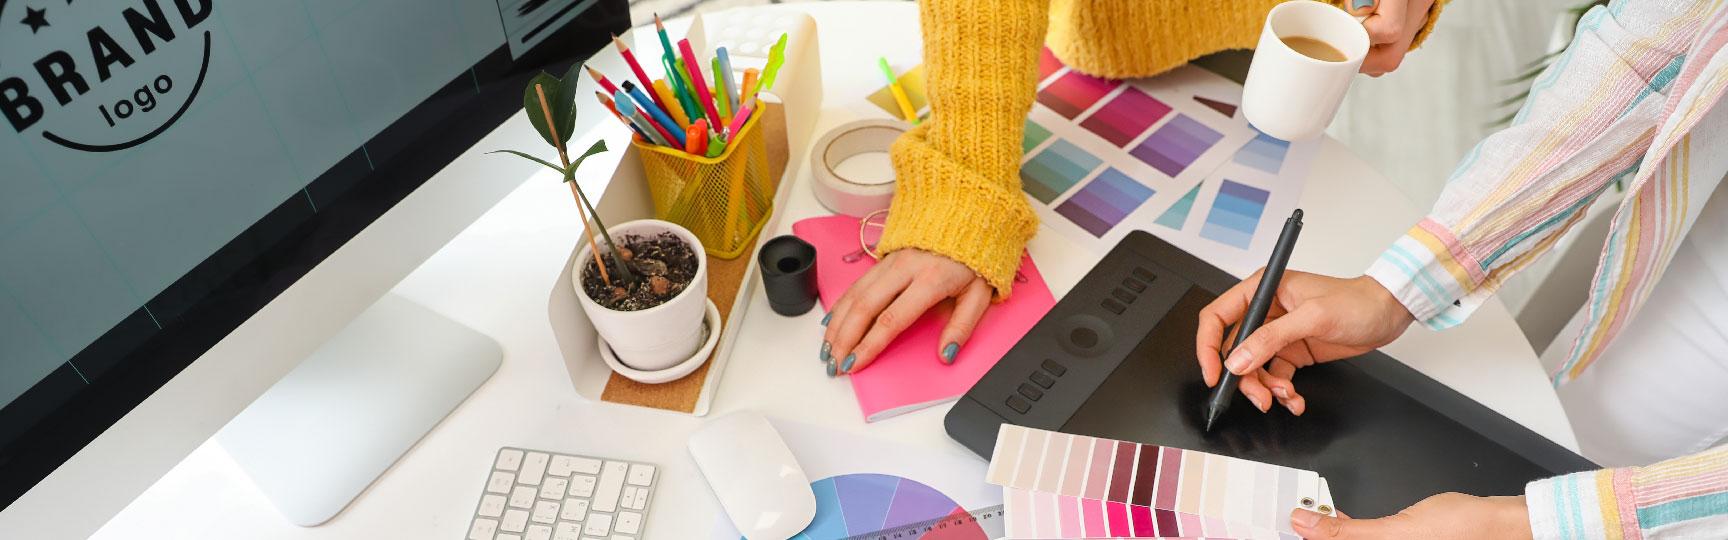 6 Brand Identity Details Your Graphic Designer Needs